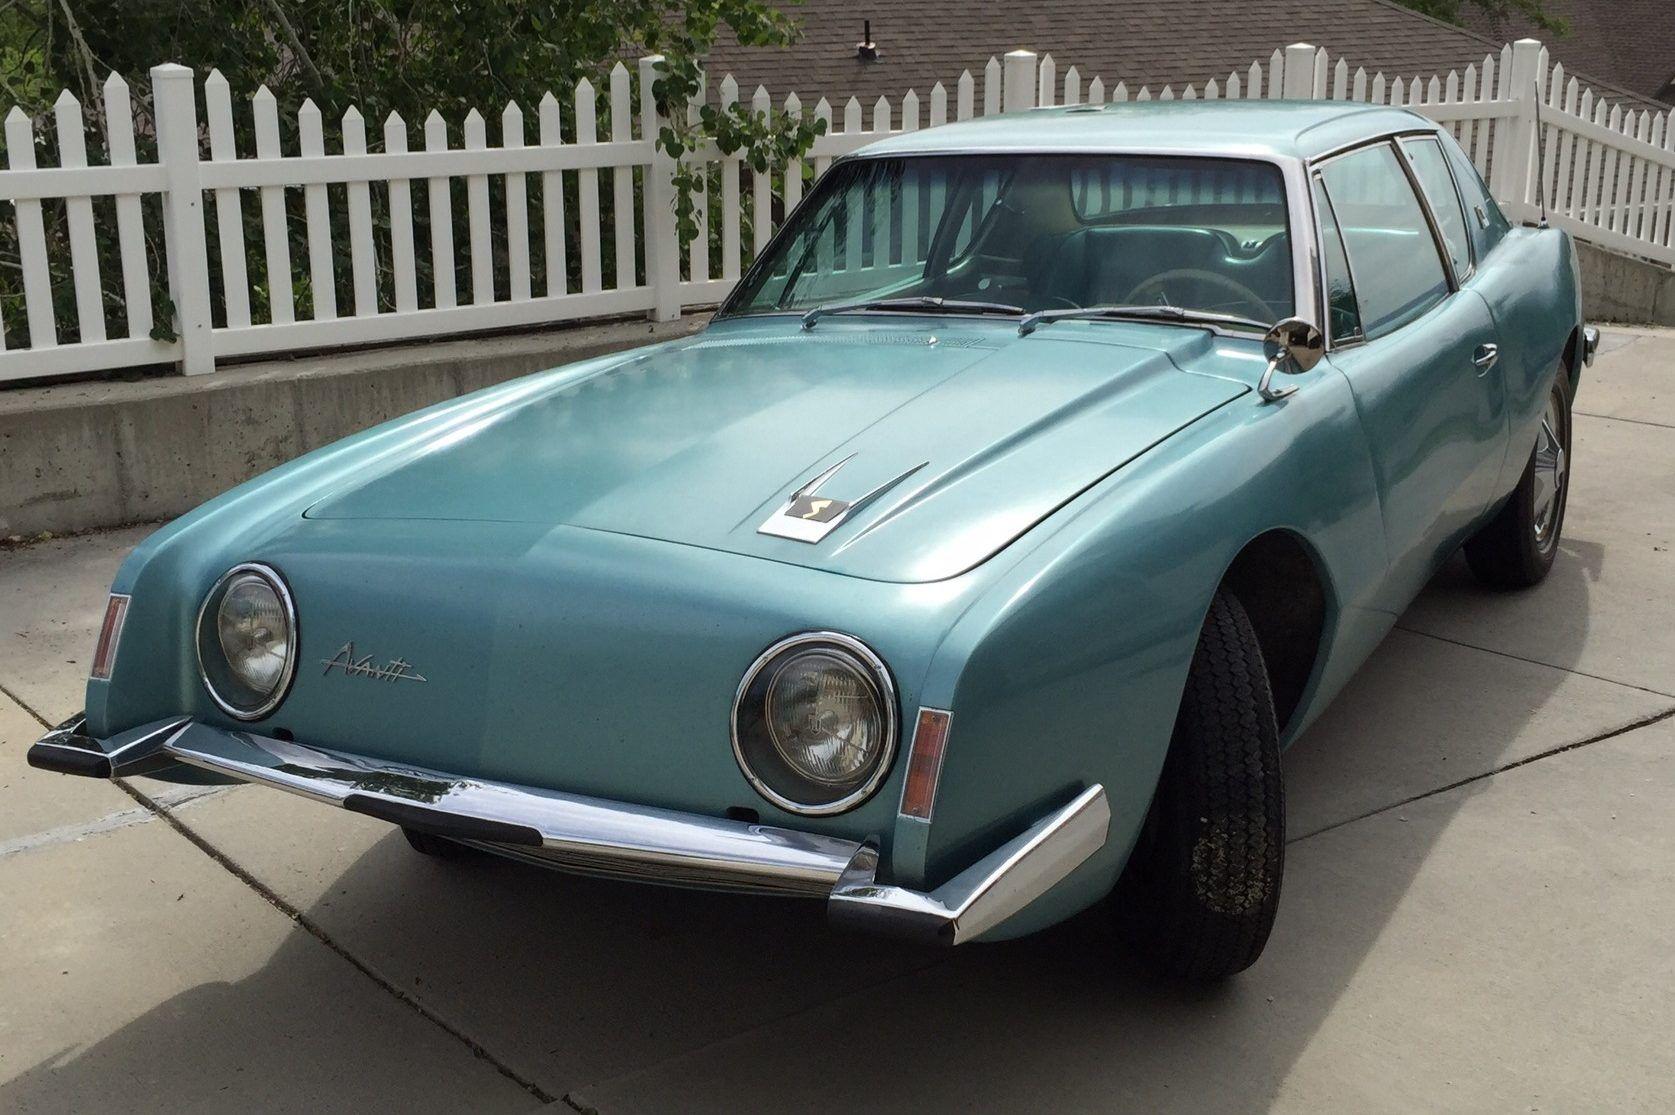 Single-Family-Owned 1963 Studebaker Avanti #sweetcars